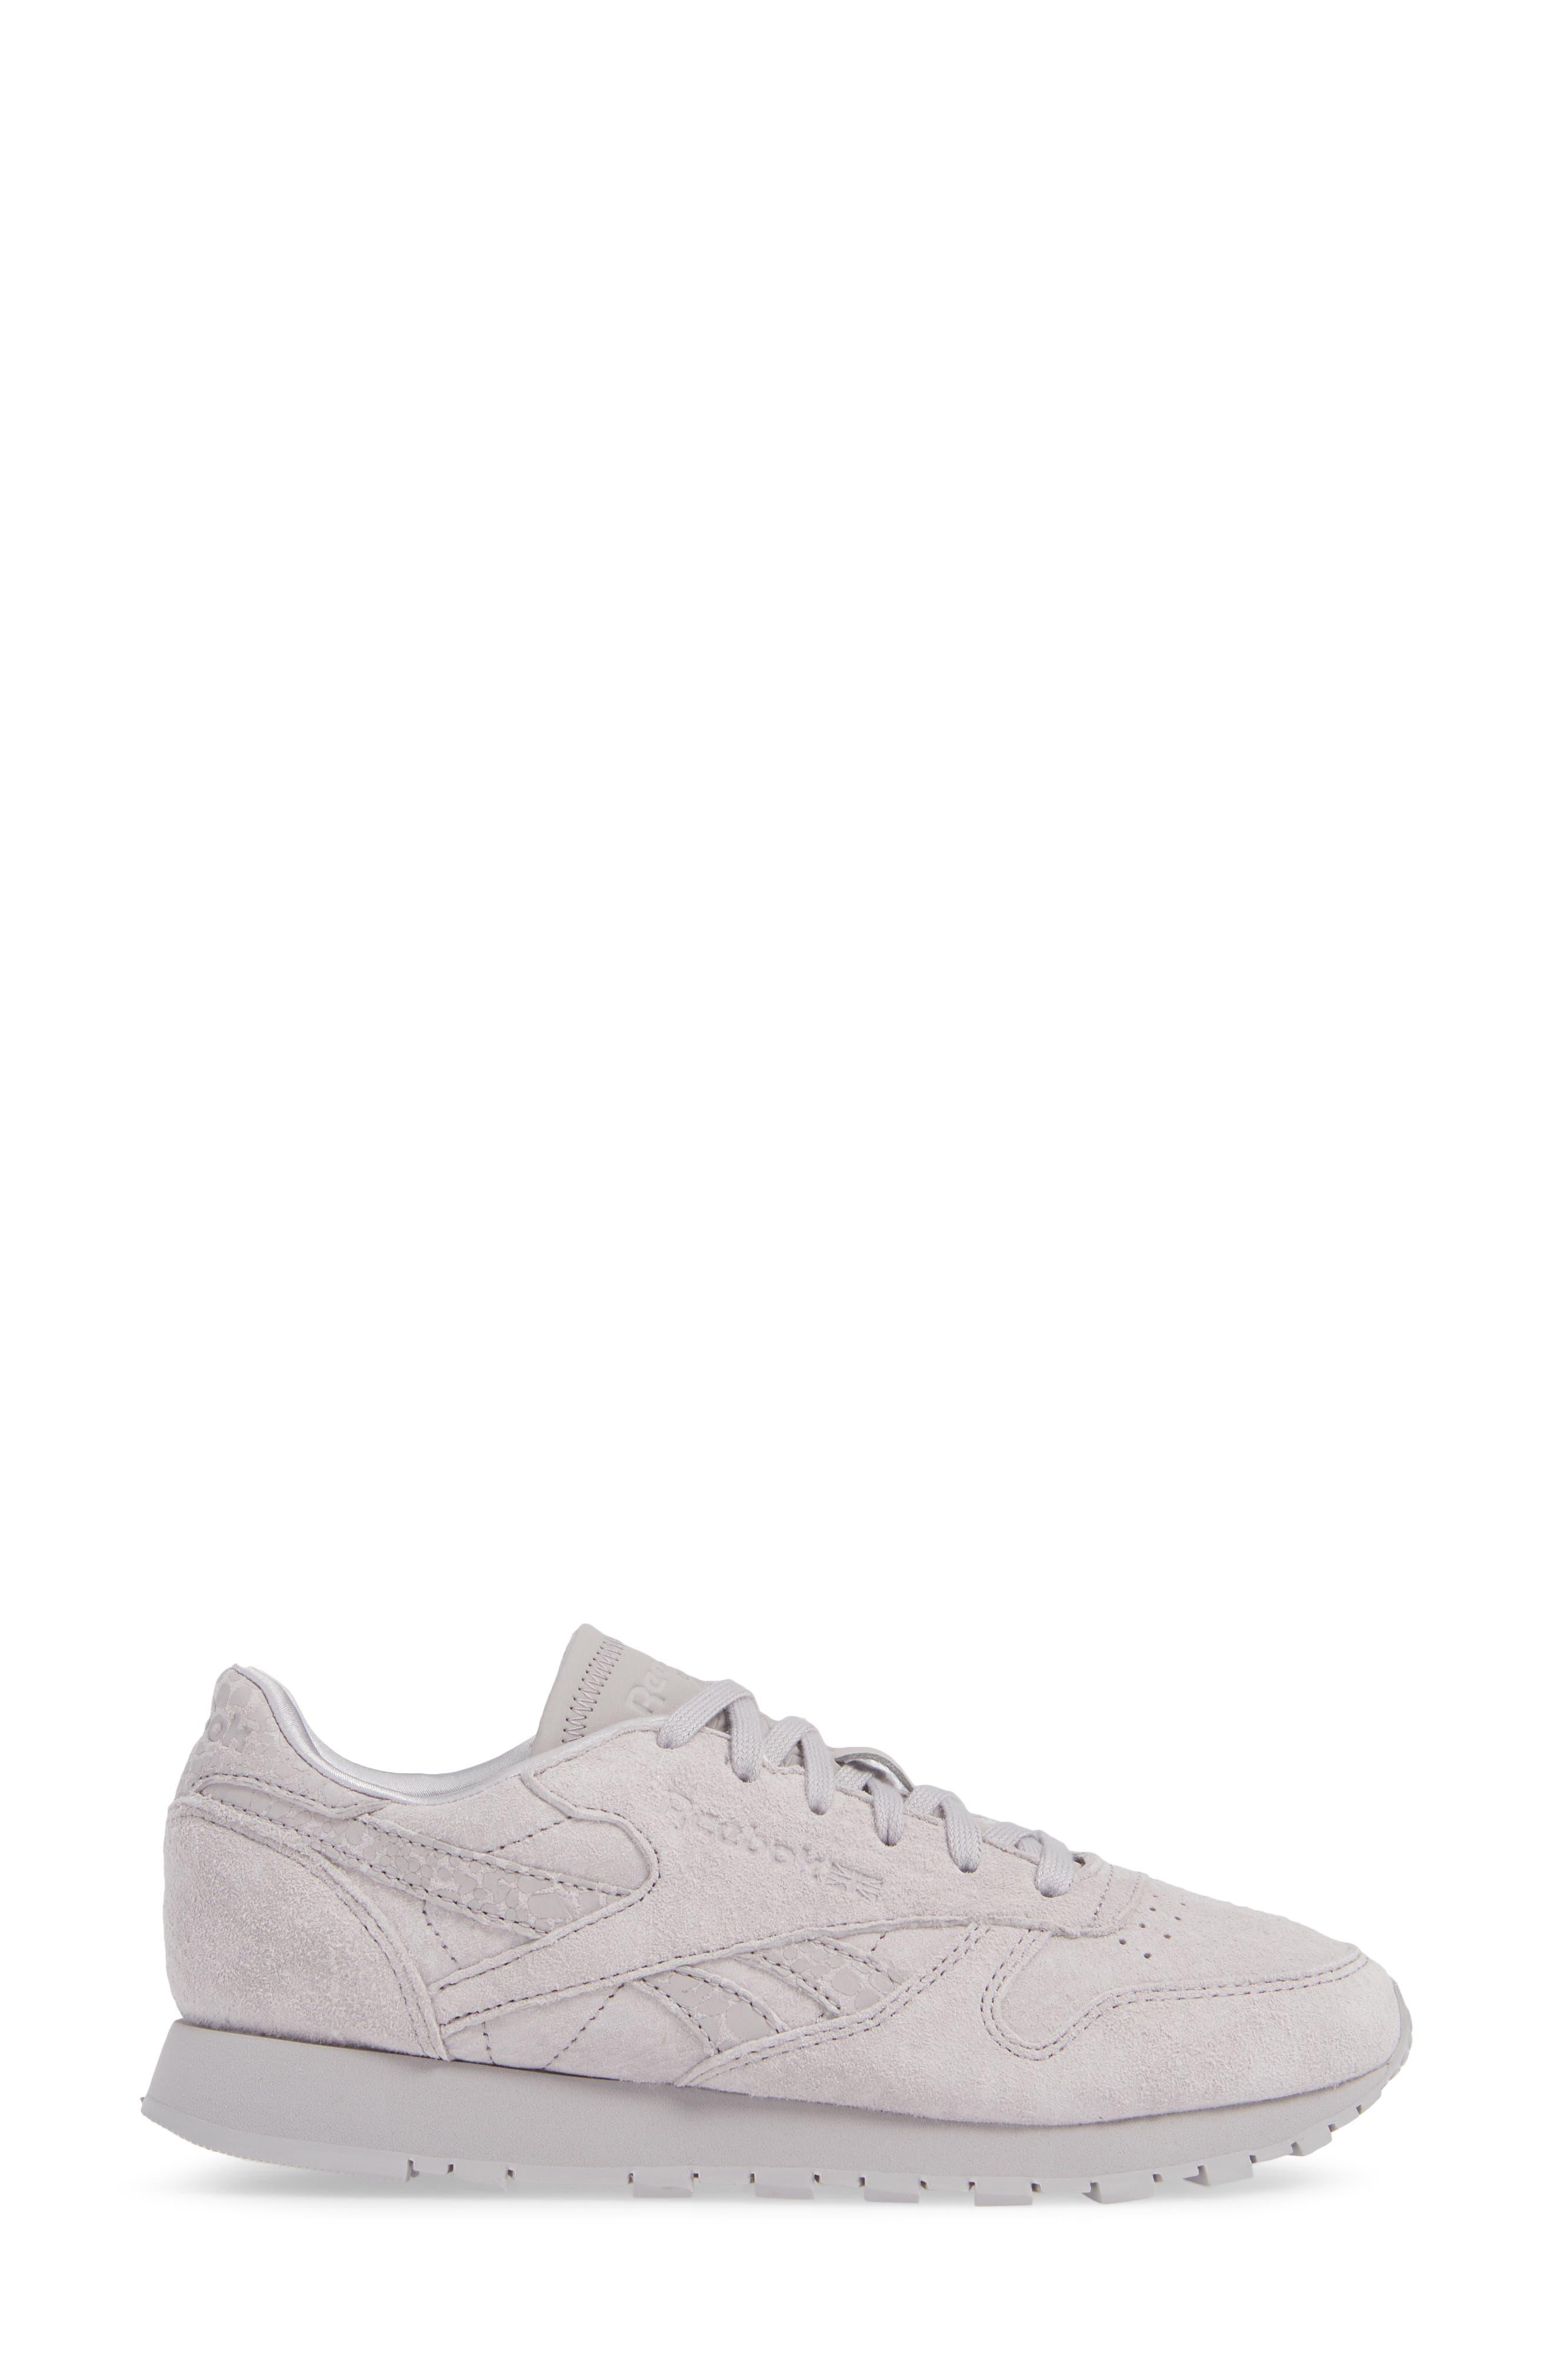 REEBOK,                             Classic Leather Sneaker,                             Alternate thumbnail 3, color,                             WHISPER GREY